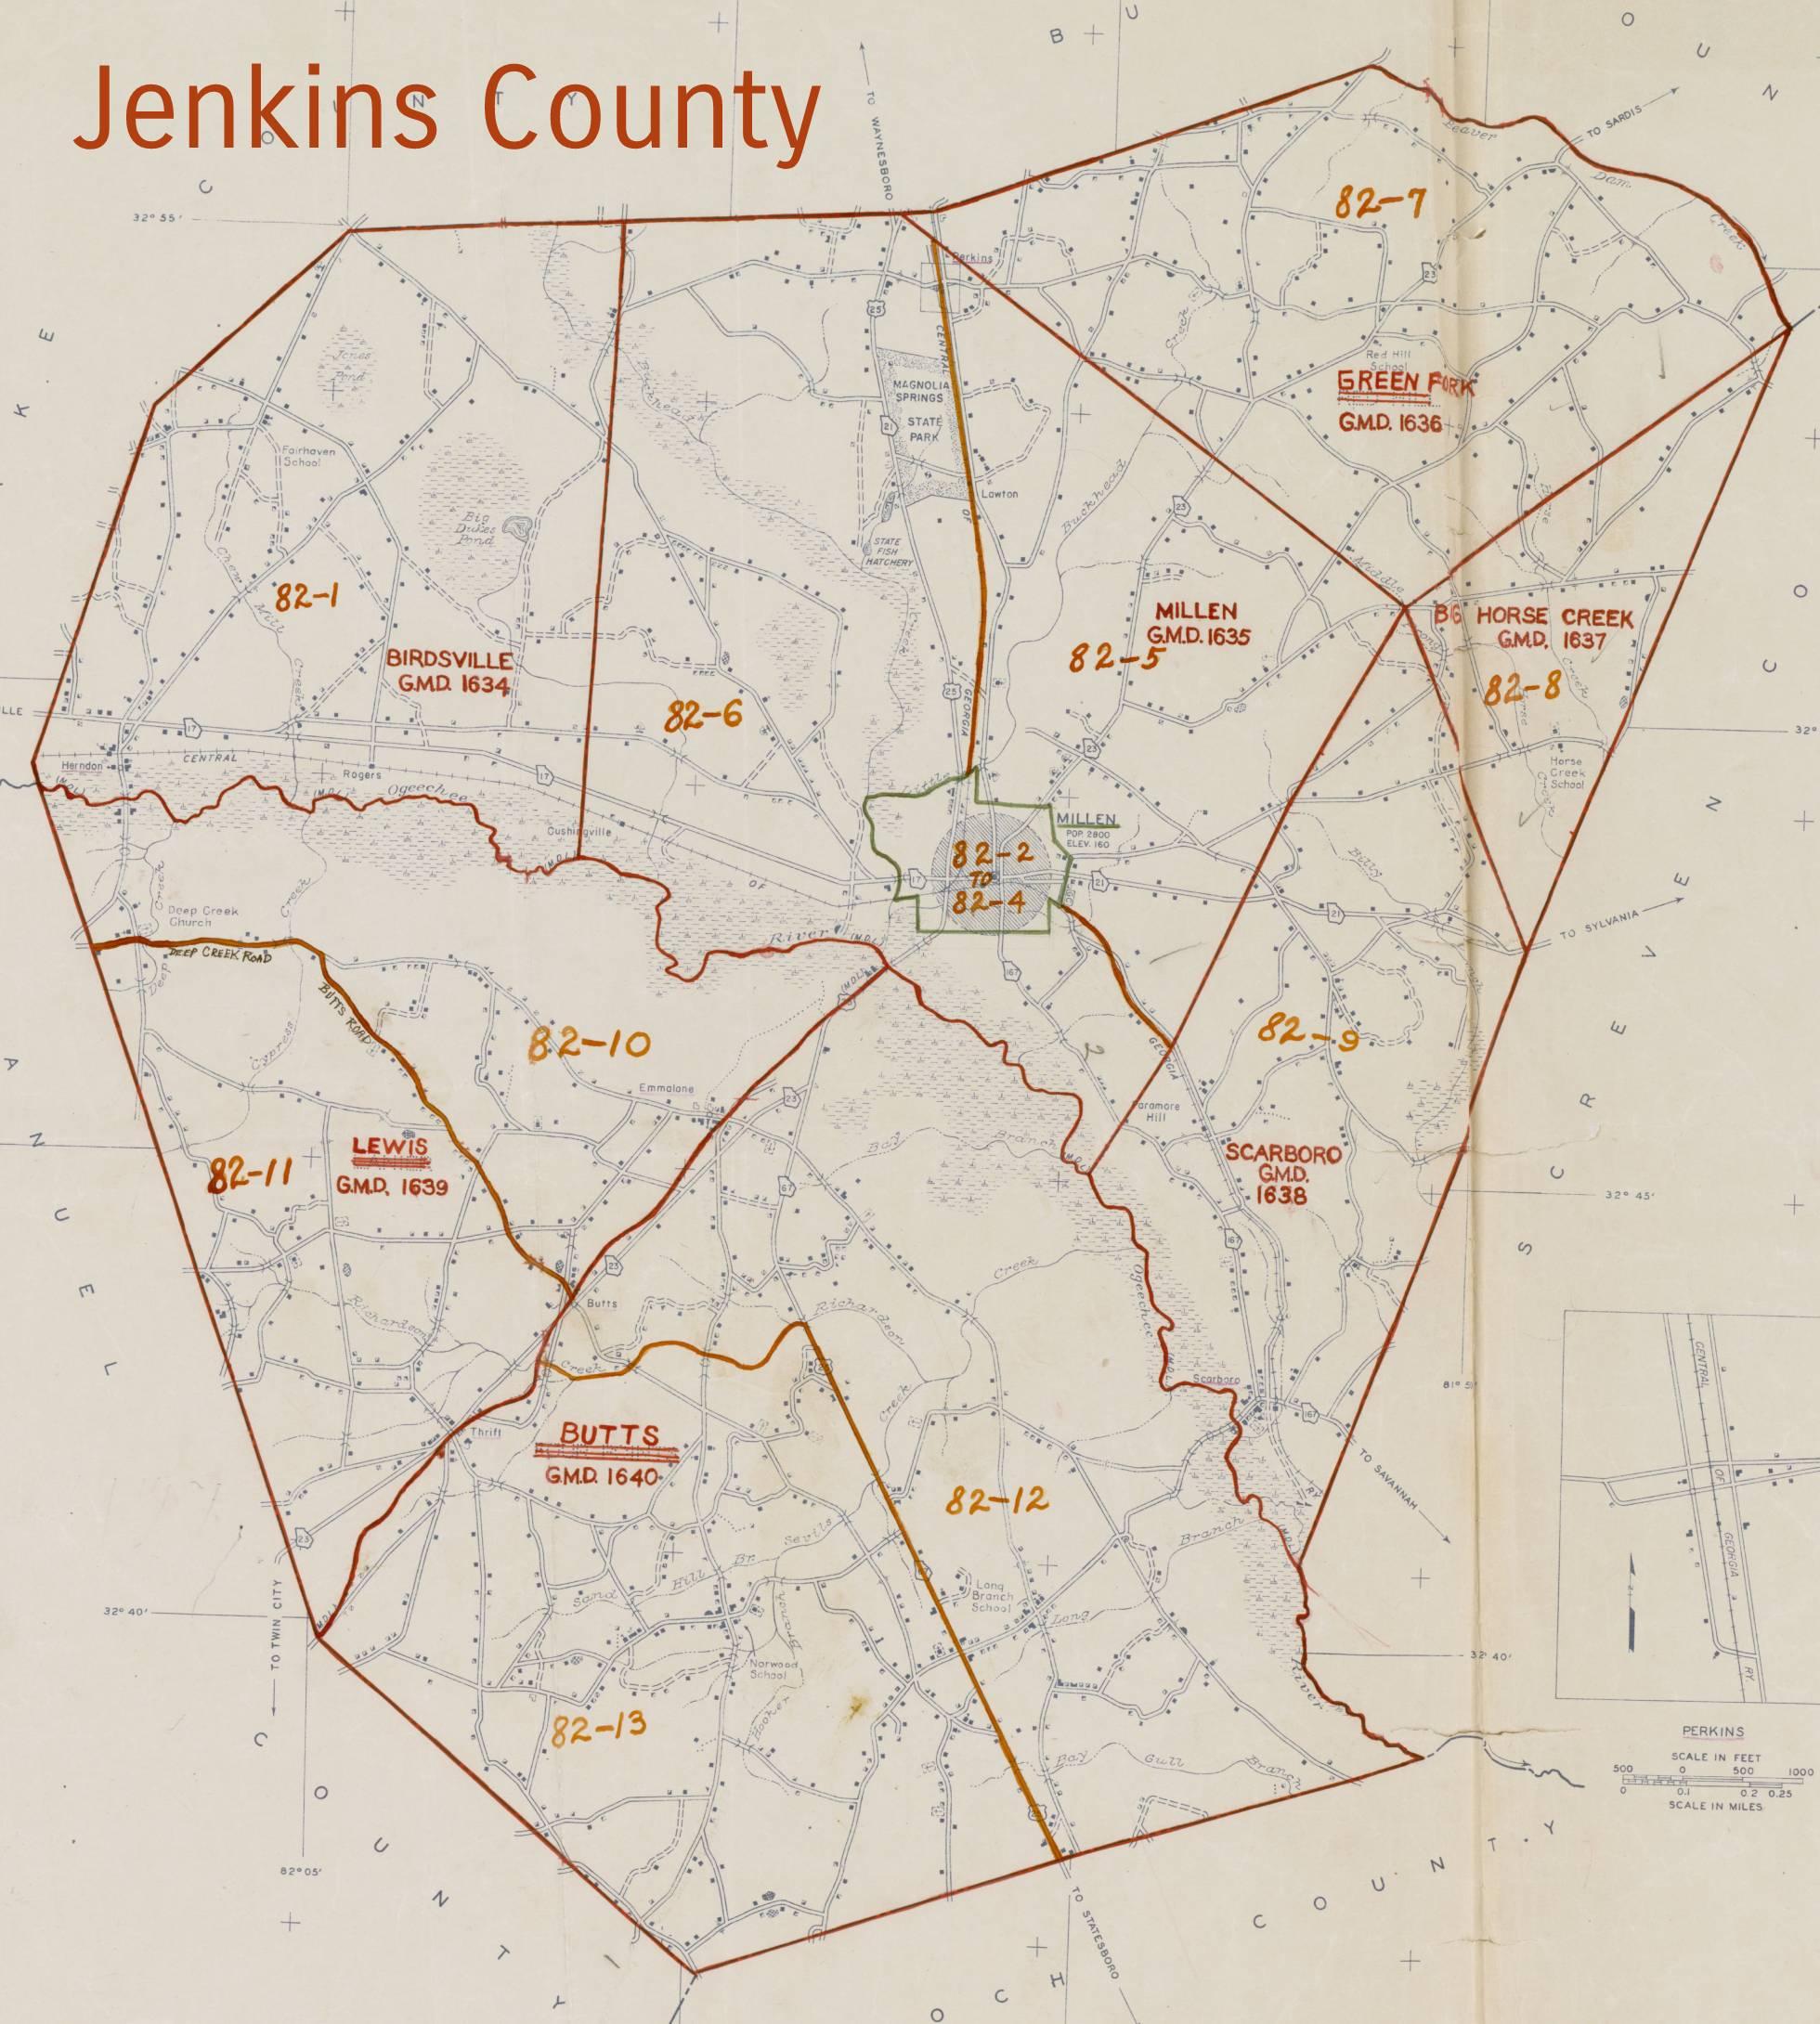 Jenkins County, Georgia, riot of 1919 - Wikipedia